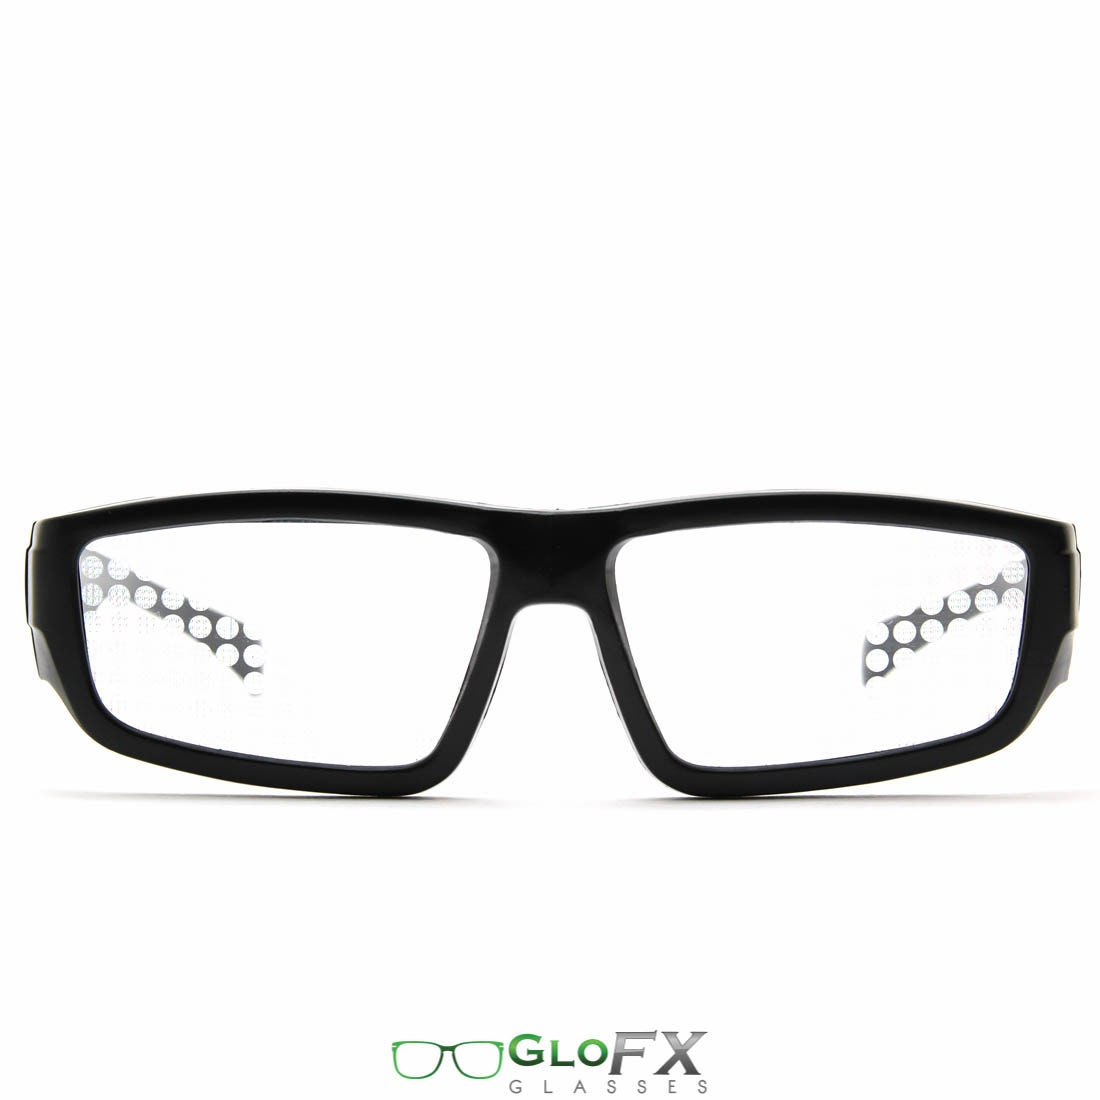 e1be86de814a GloFX Spiral Diffraction Glasses Standard Black Sunglasses